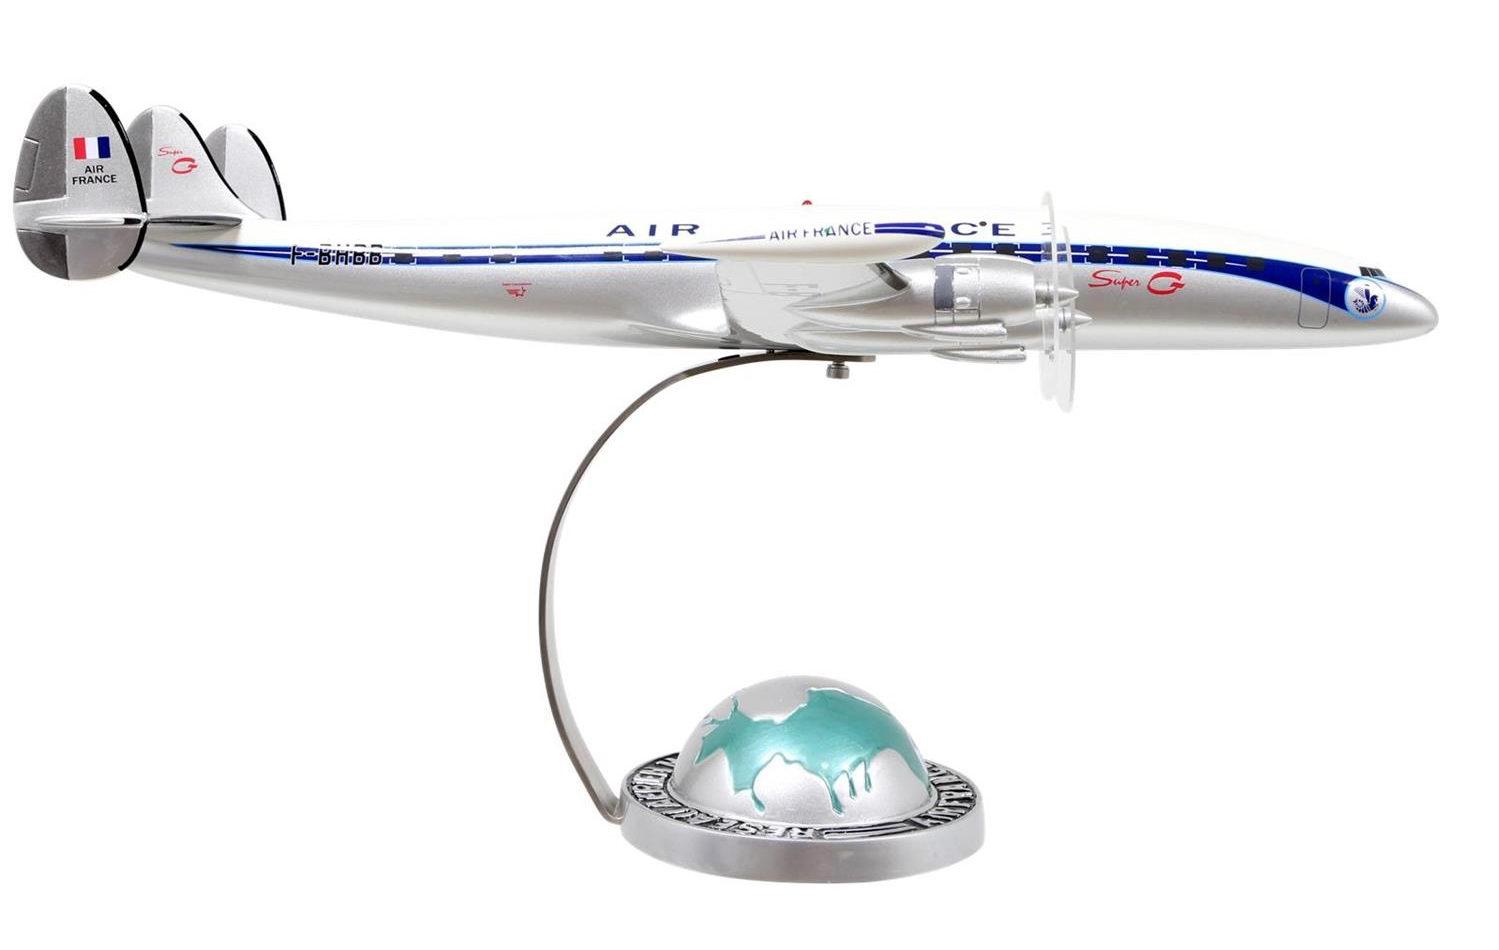 Maquette Avion Super G SUPER CONSTELLATION AIR FRANCE